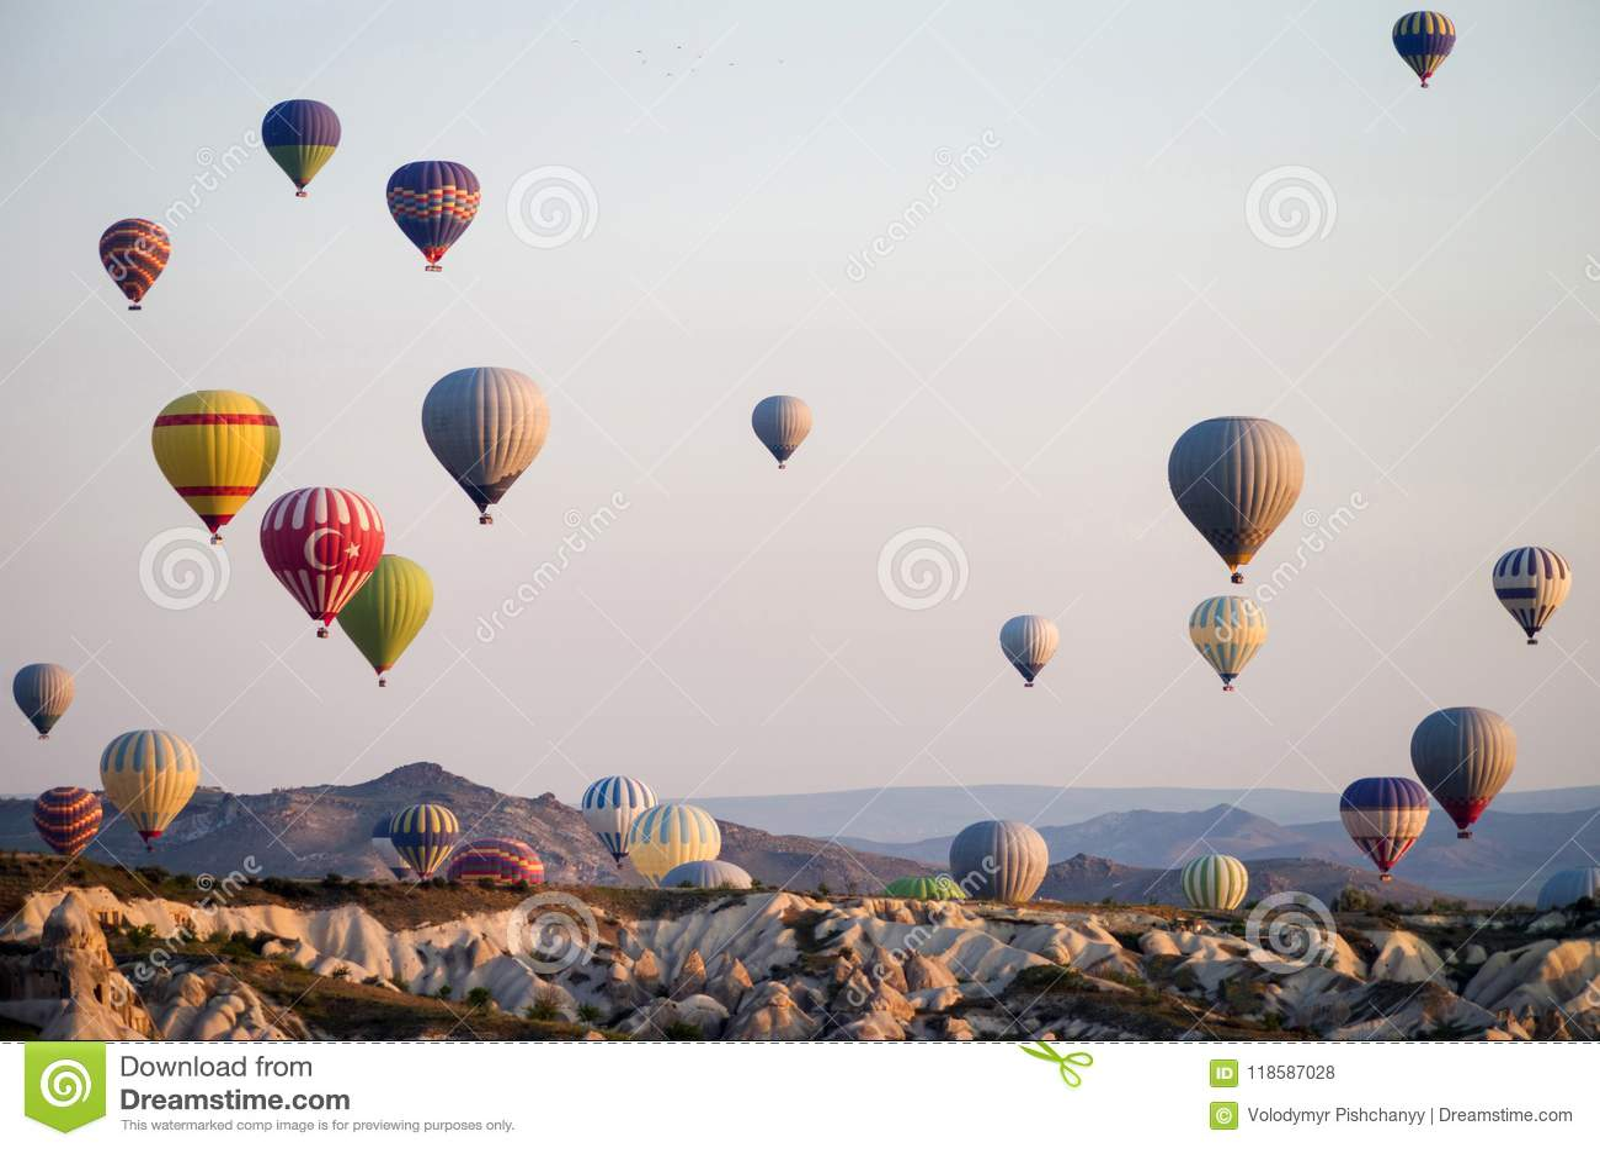 Hot air balloons at sunrise flying over Cappadocia, Turkey. A balloon with a flag of Turkey